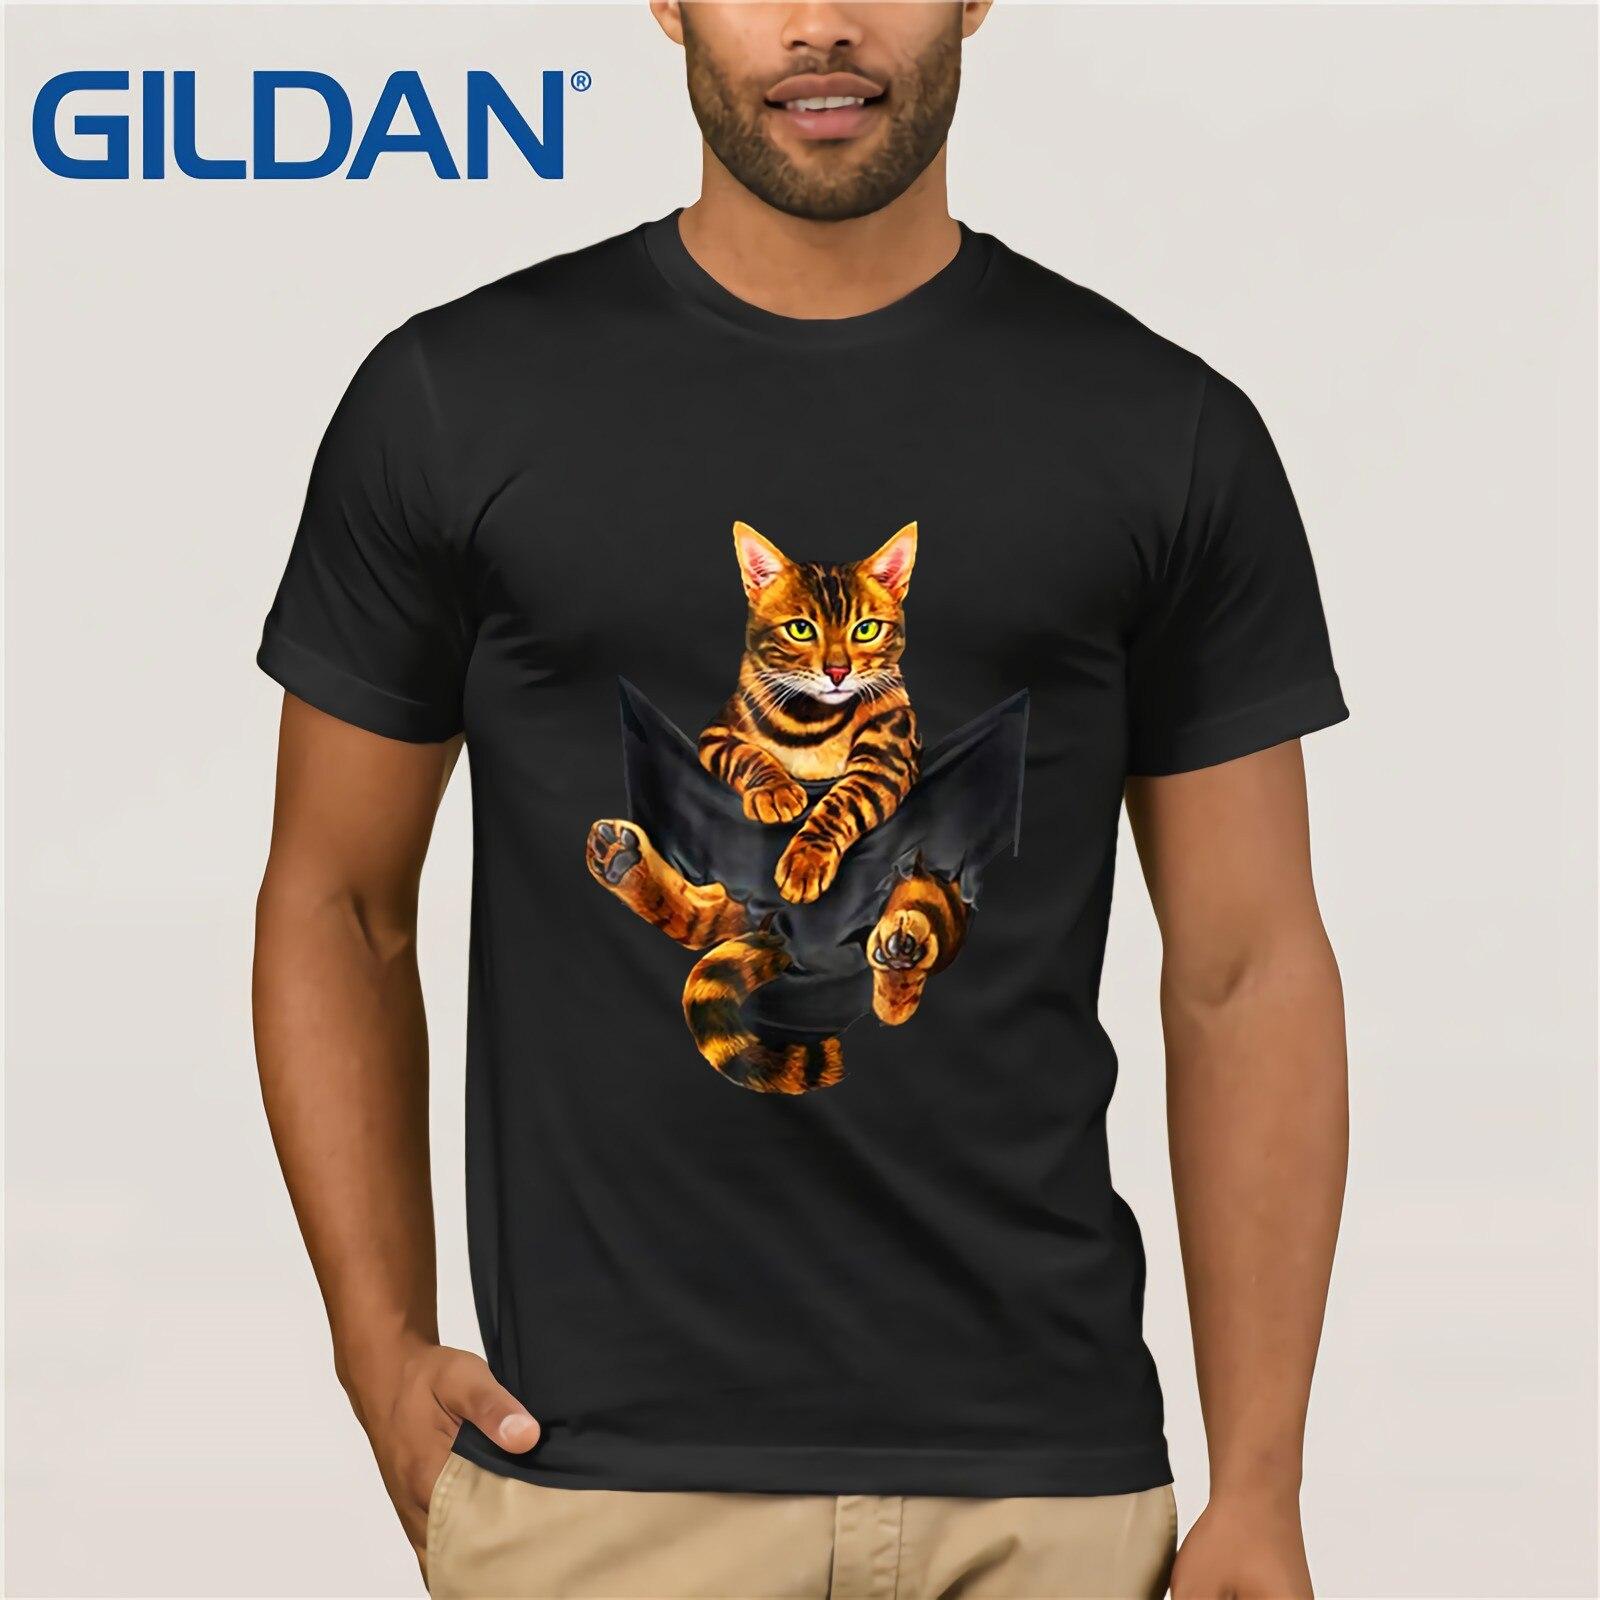 The Golden Bengal Cat 2018 S 2019 Summer Men's Short Sleeve T-Shirt O Neck Cotton Tees Tops Funny Tees Cotton Tops T Shirt